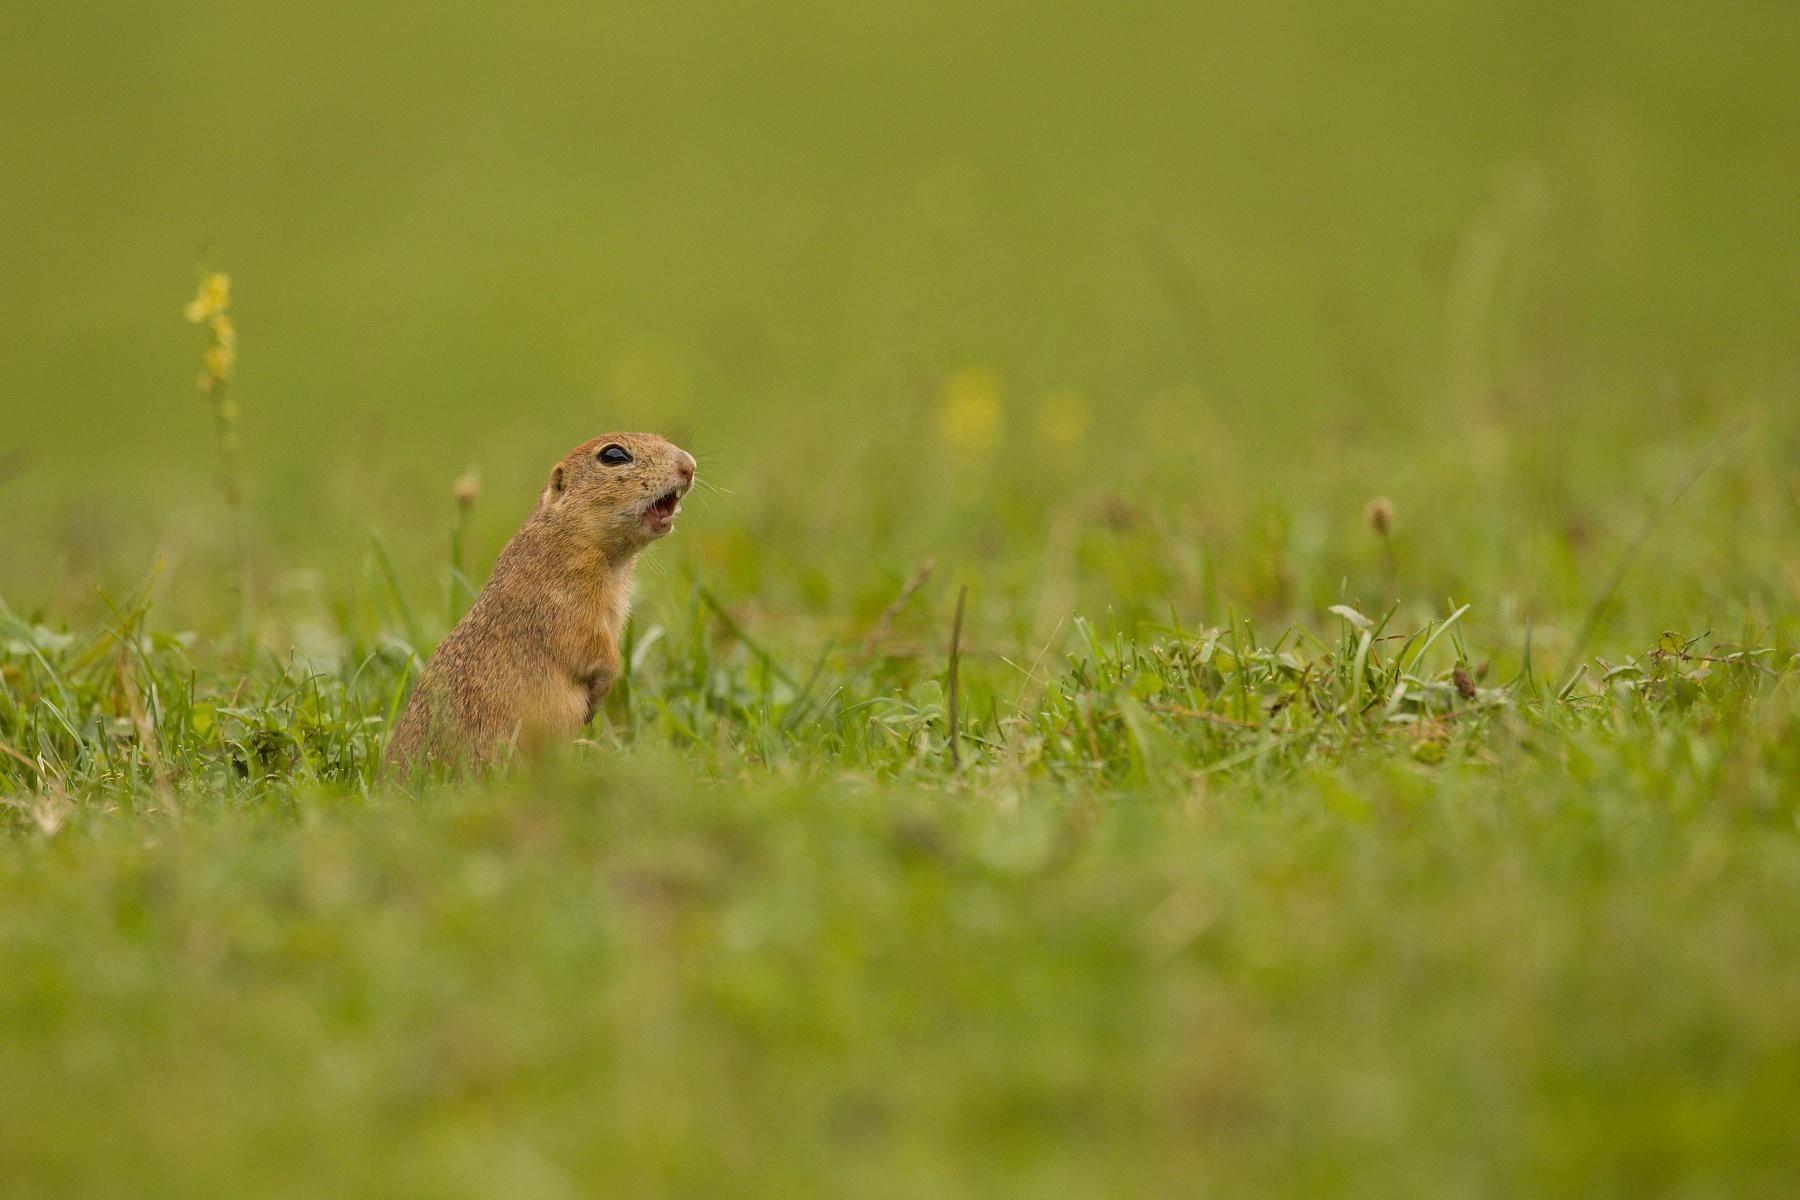 syseľ pasienkový (Spermophilus citellus) European ground squirrel, Muránska planina, Slovensko Canon EOS 6D mark II, Canon 100-400mm, f4.5-5.6 L IS II USM, 400 mm, 1/320, f7.1, ISO 640, 11. september 2020